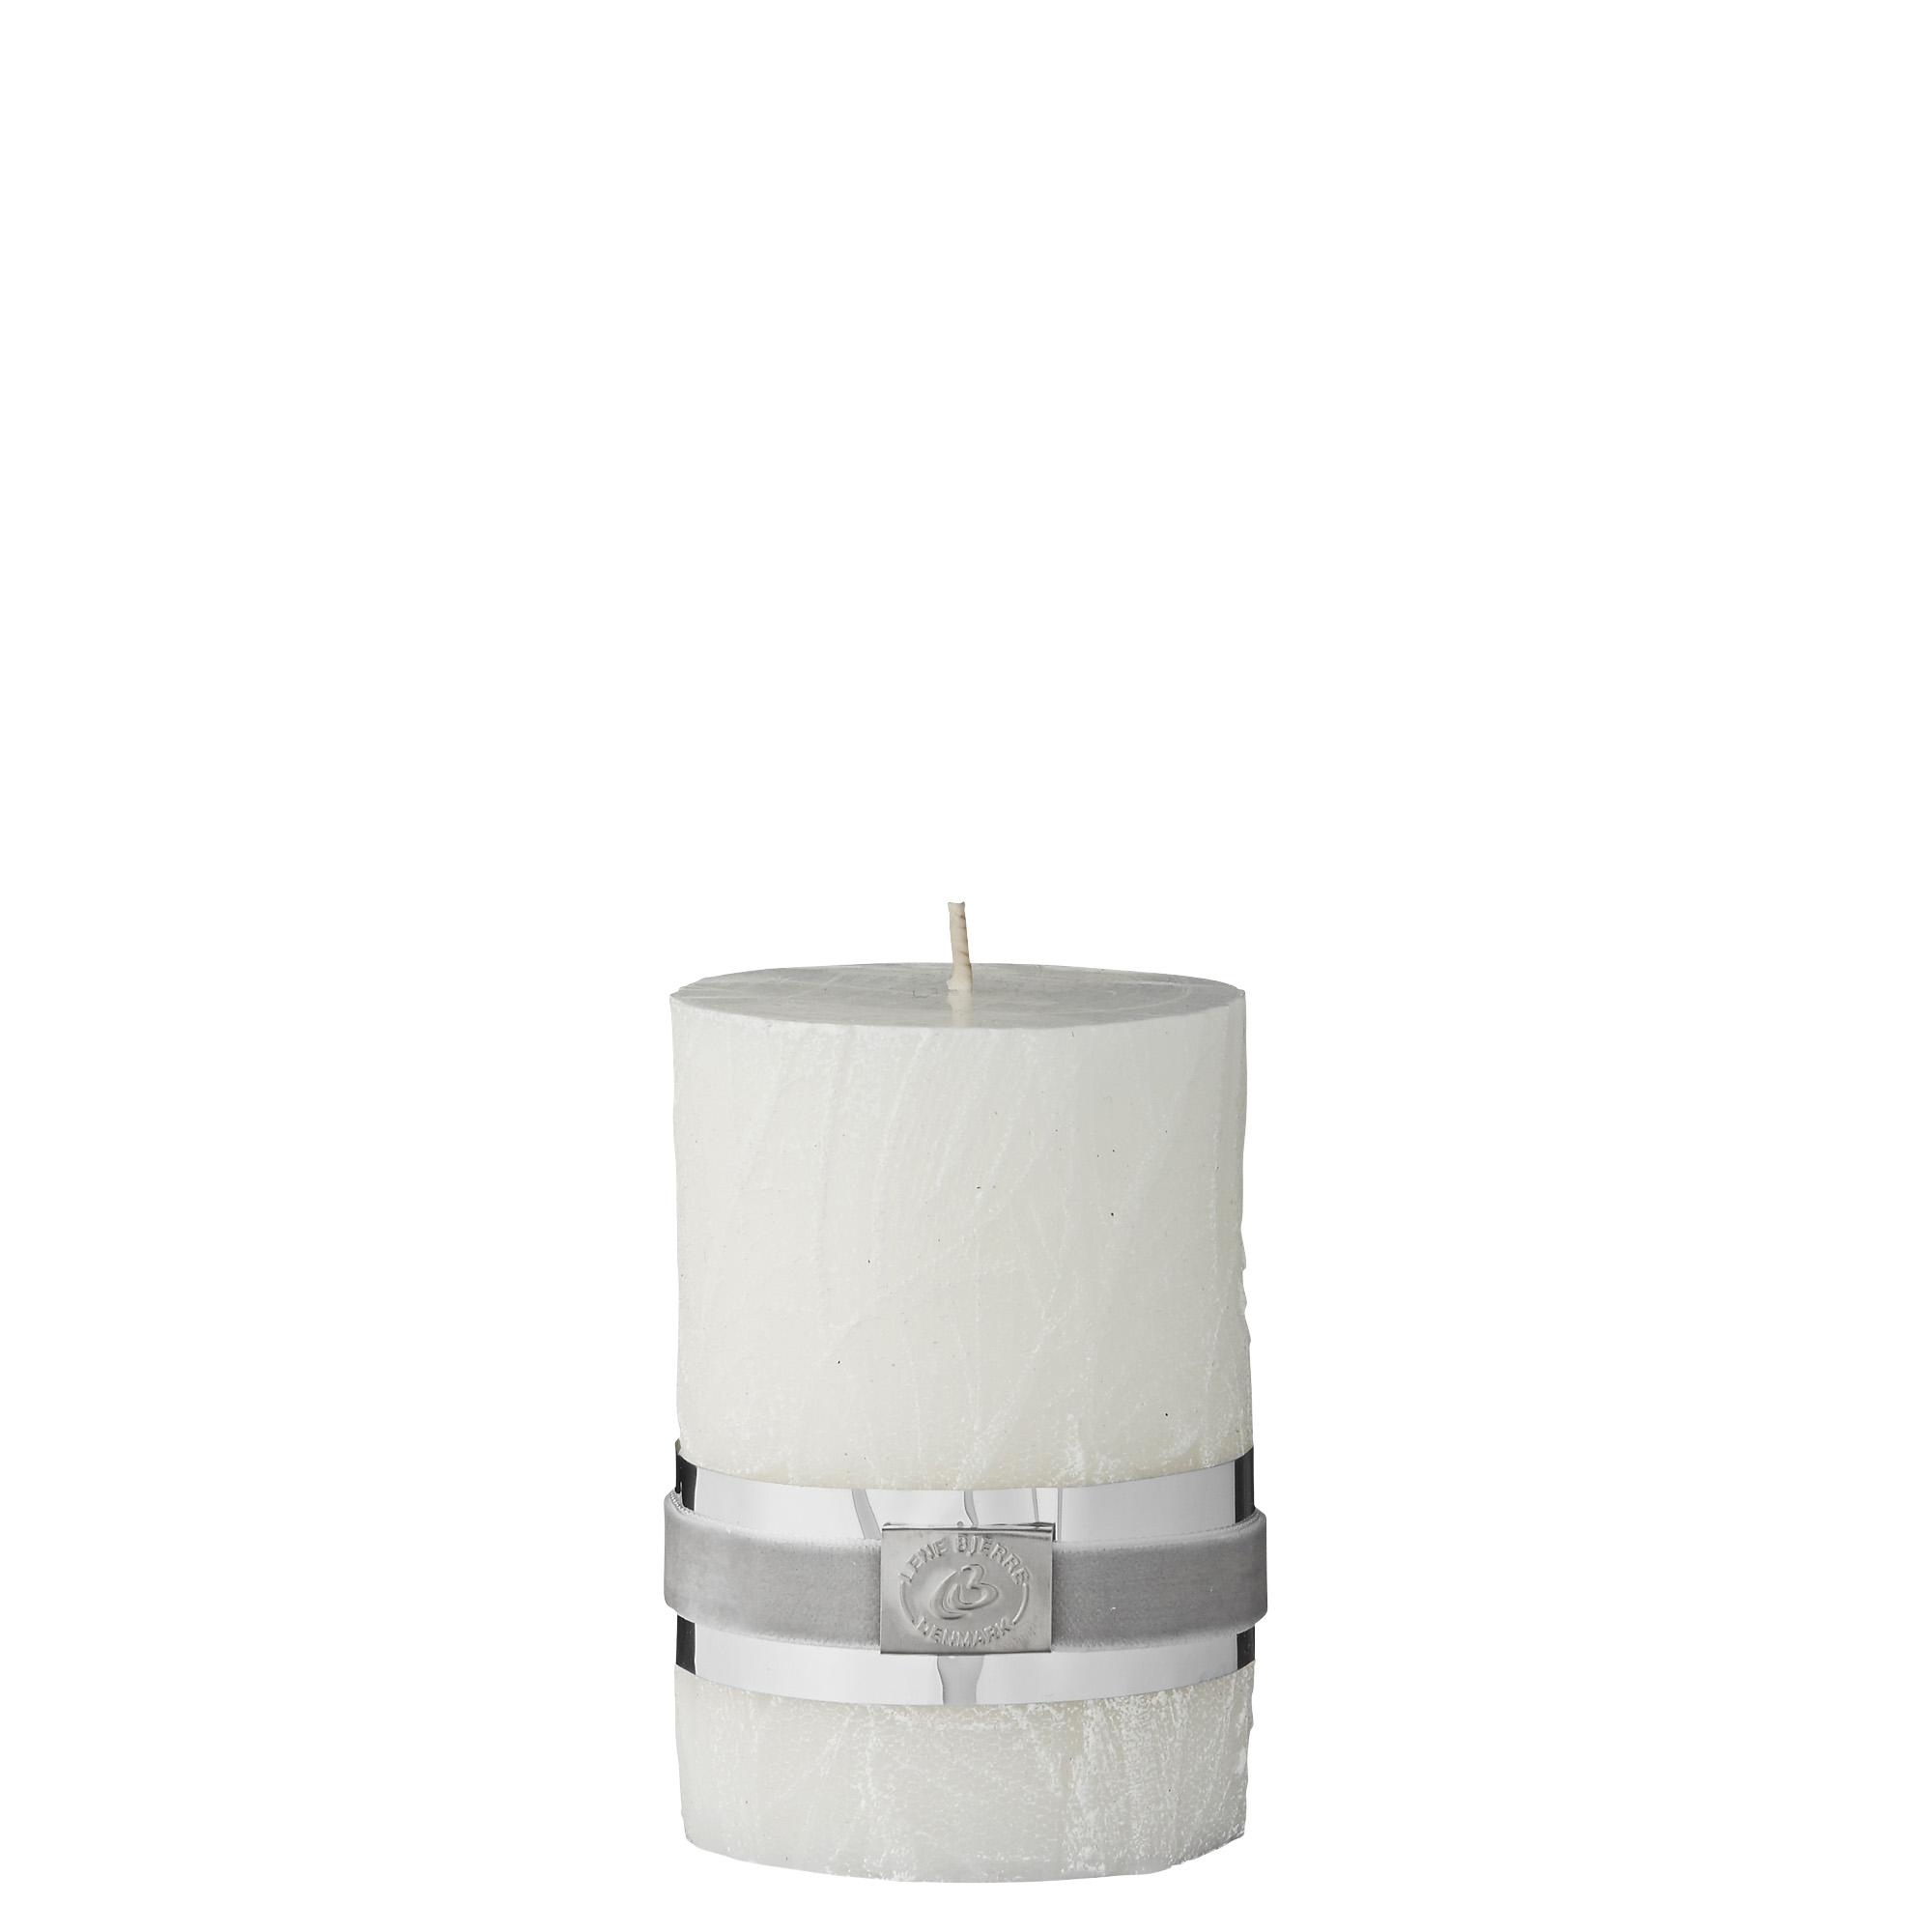 Lene Bjerre White Leaf Carved Candle Tutti Decor Ltd